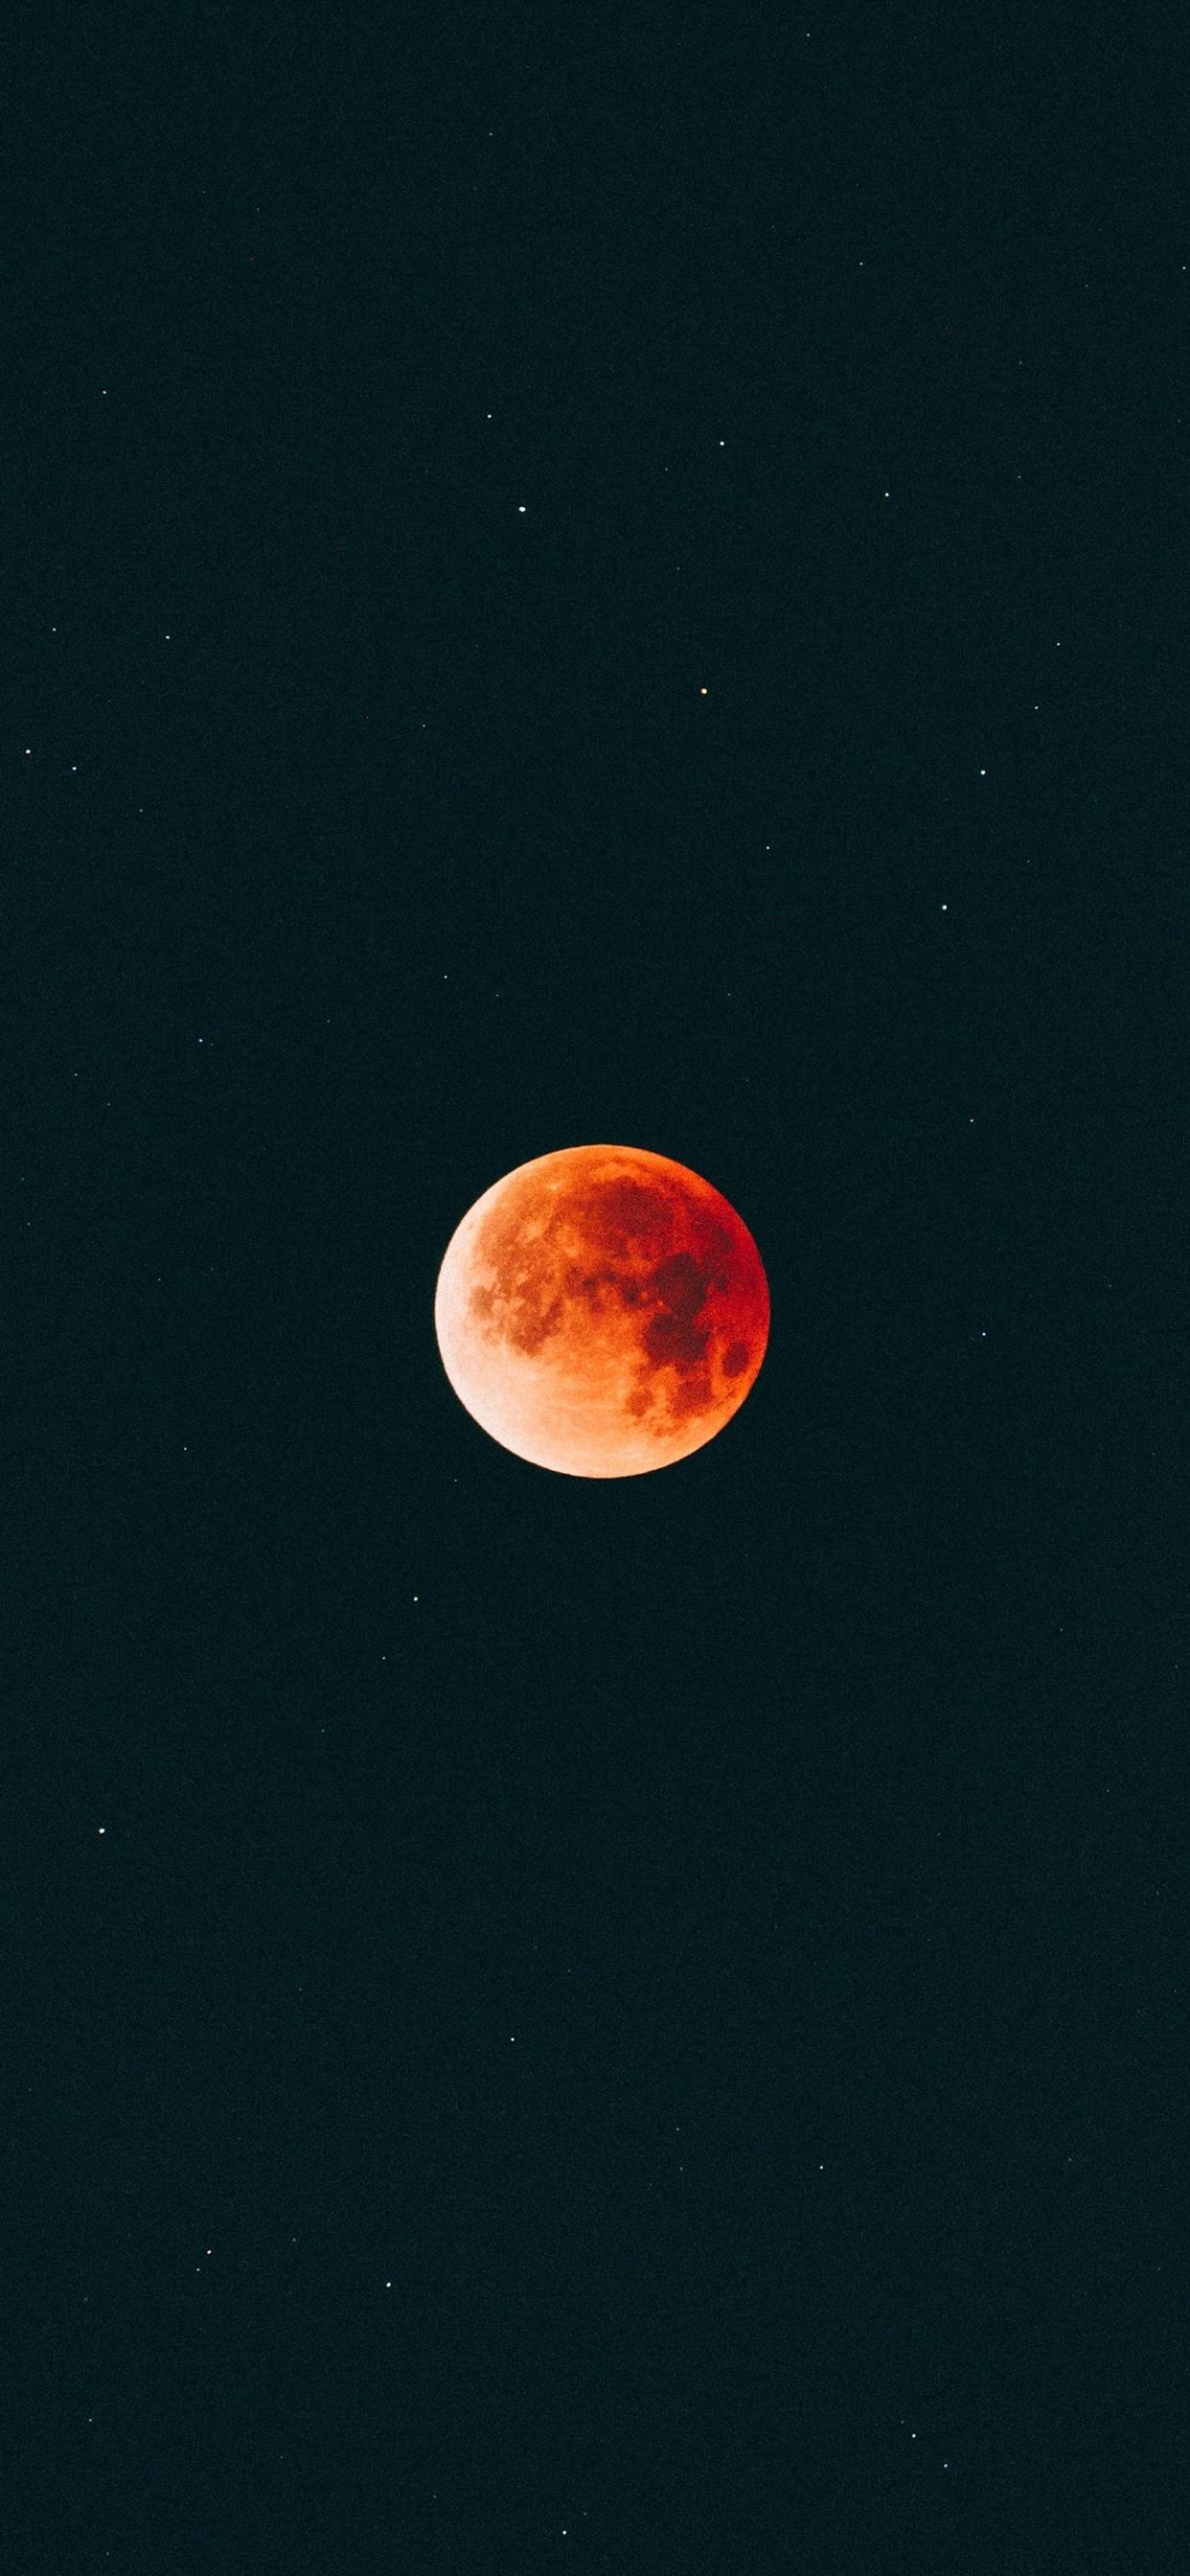 new arrival d843a e7cb4 Moon, orange, night, sky 1242x2688 iPhone XS Max wallpaper ...